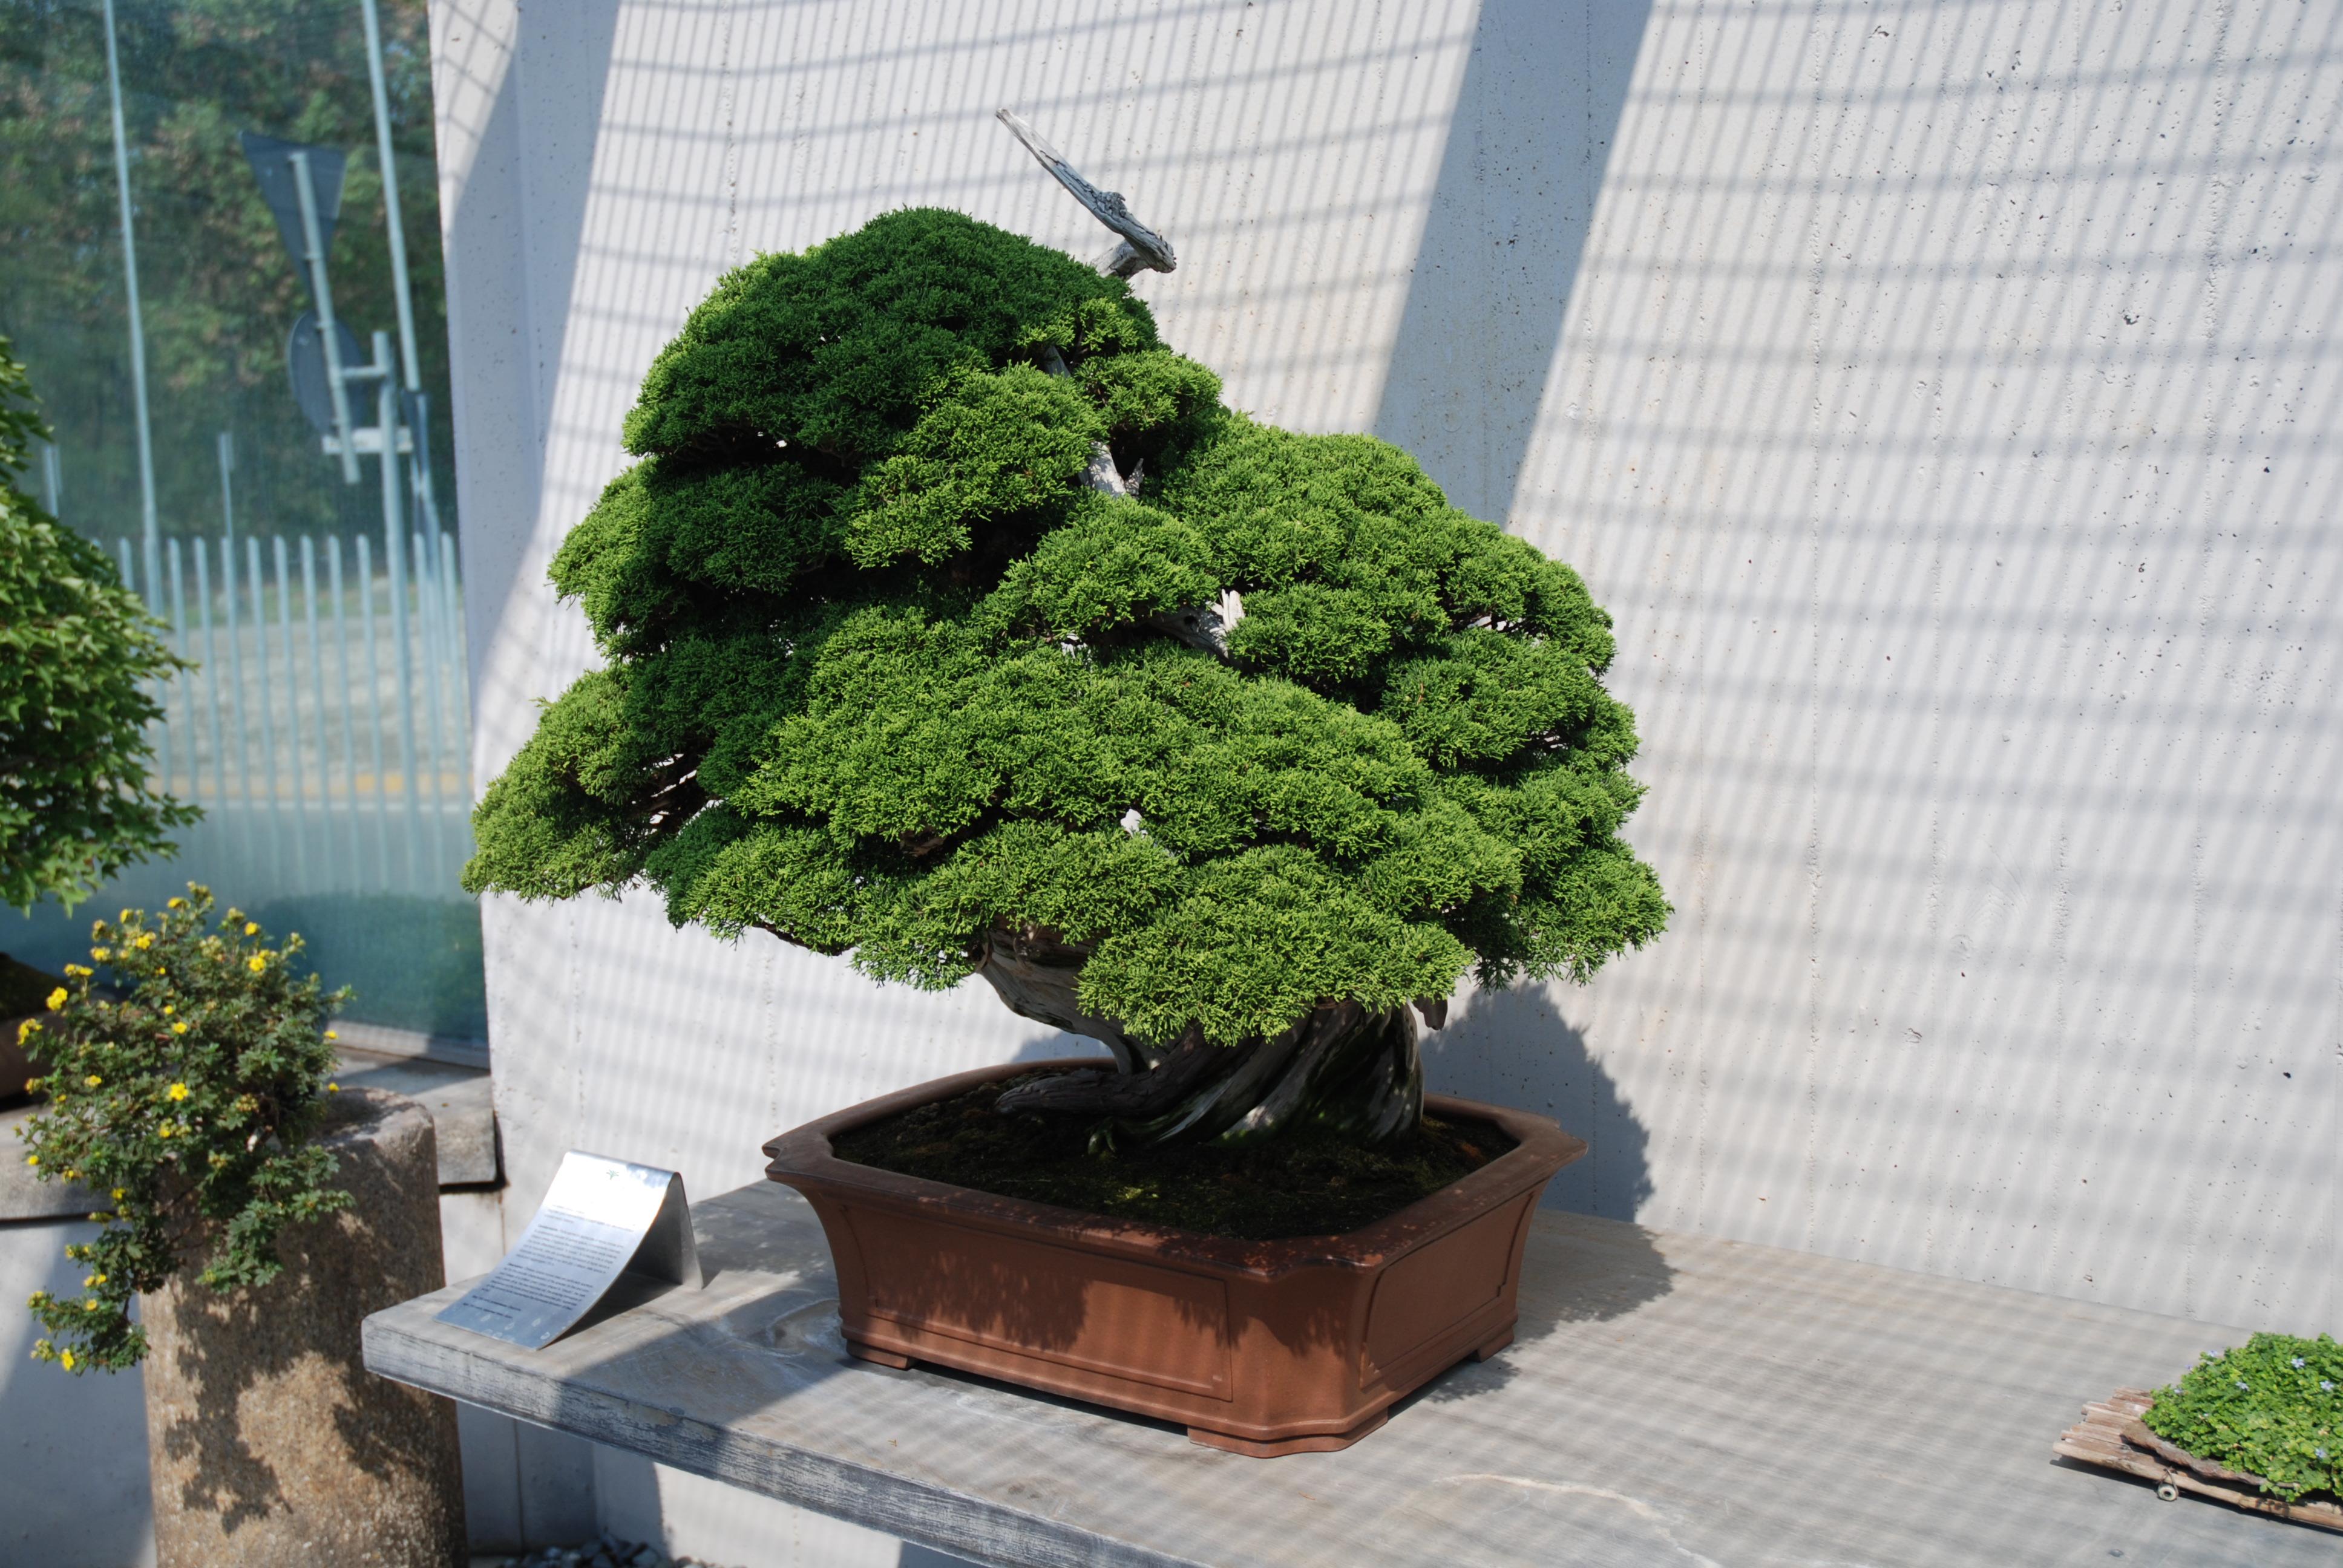 Bonsai Juneperus centenario